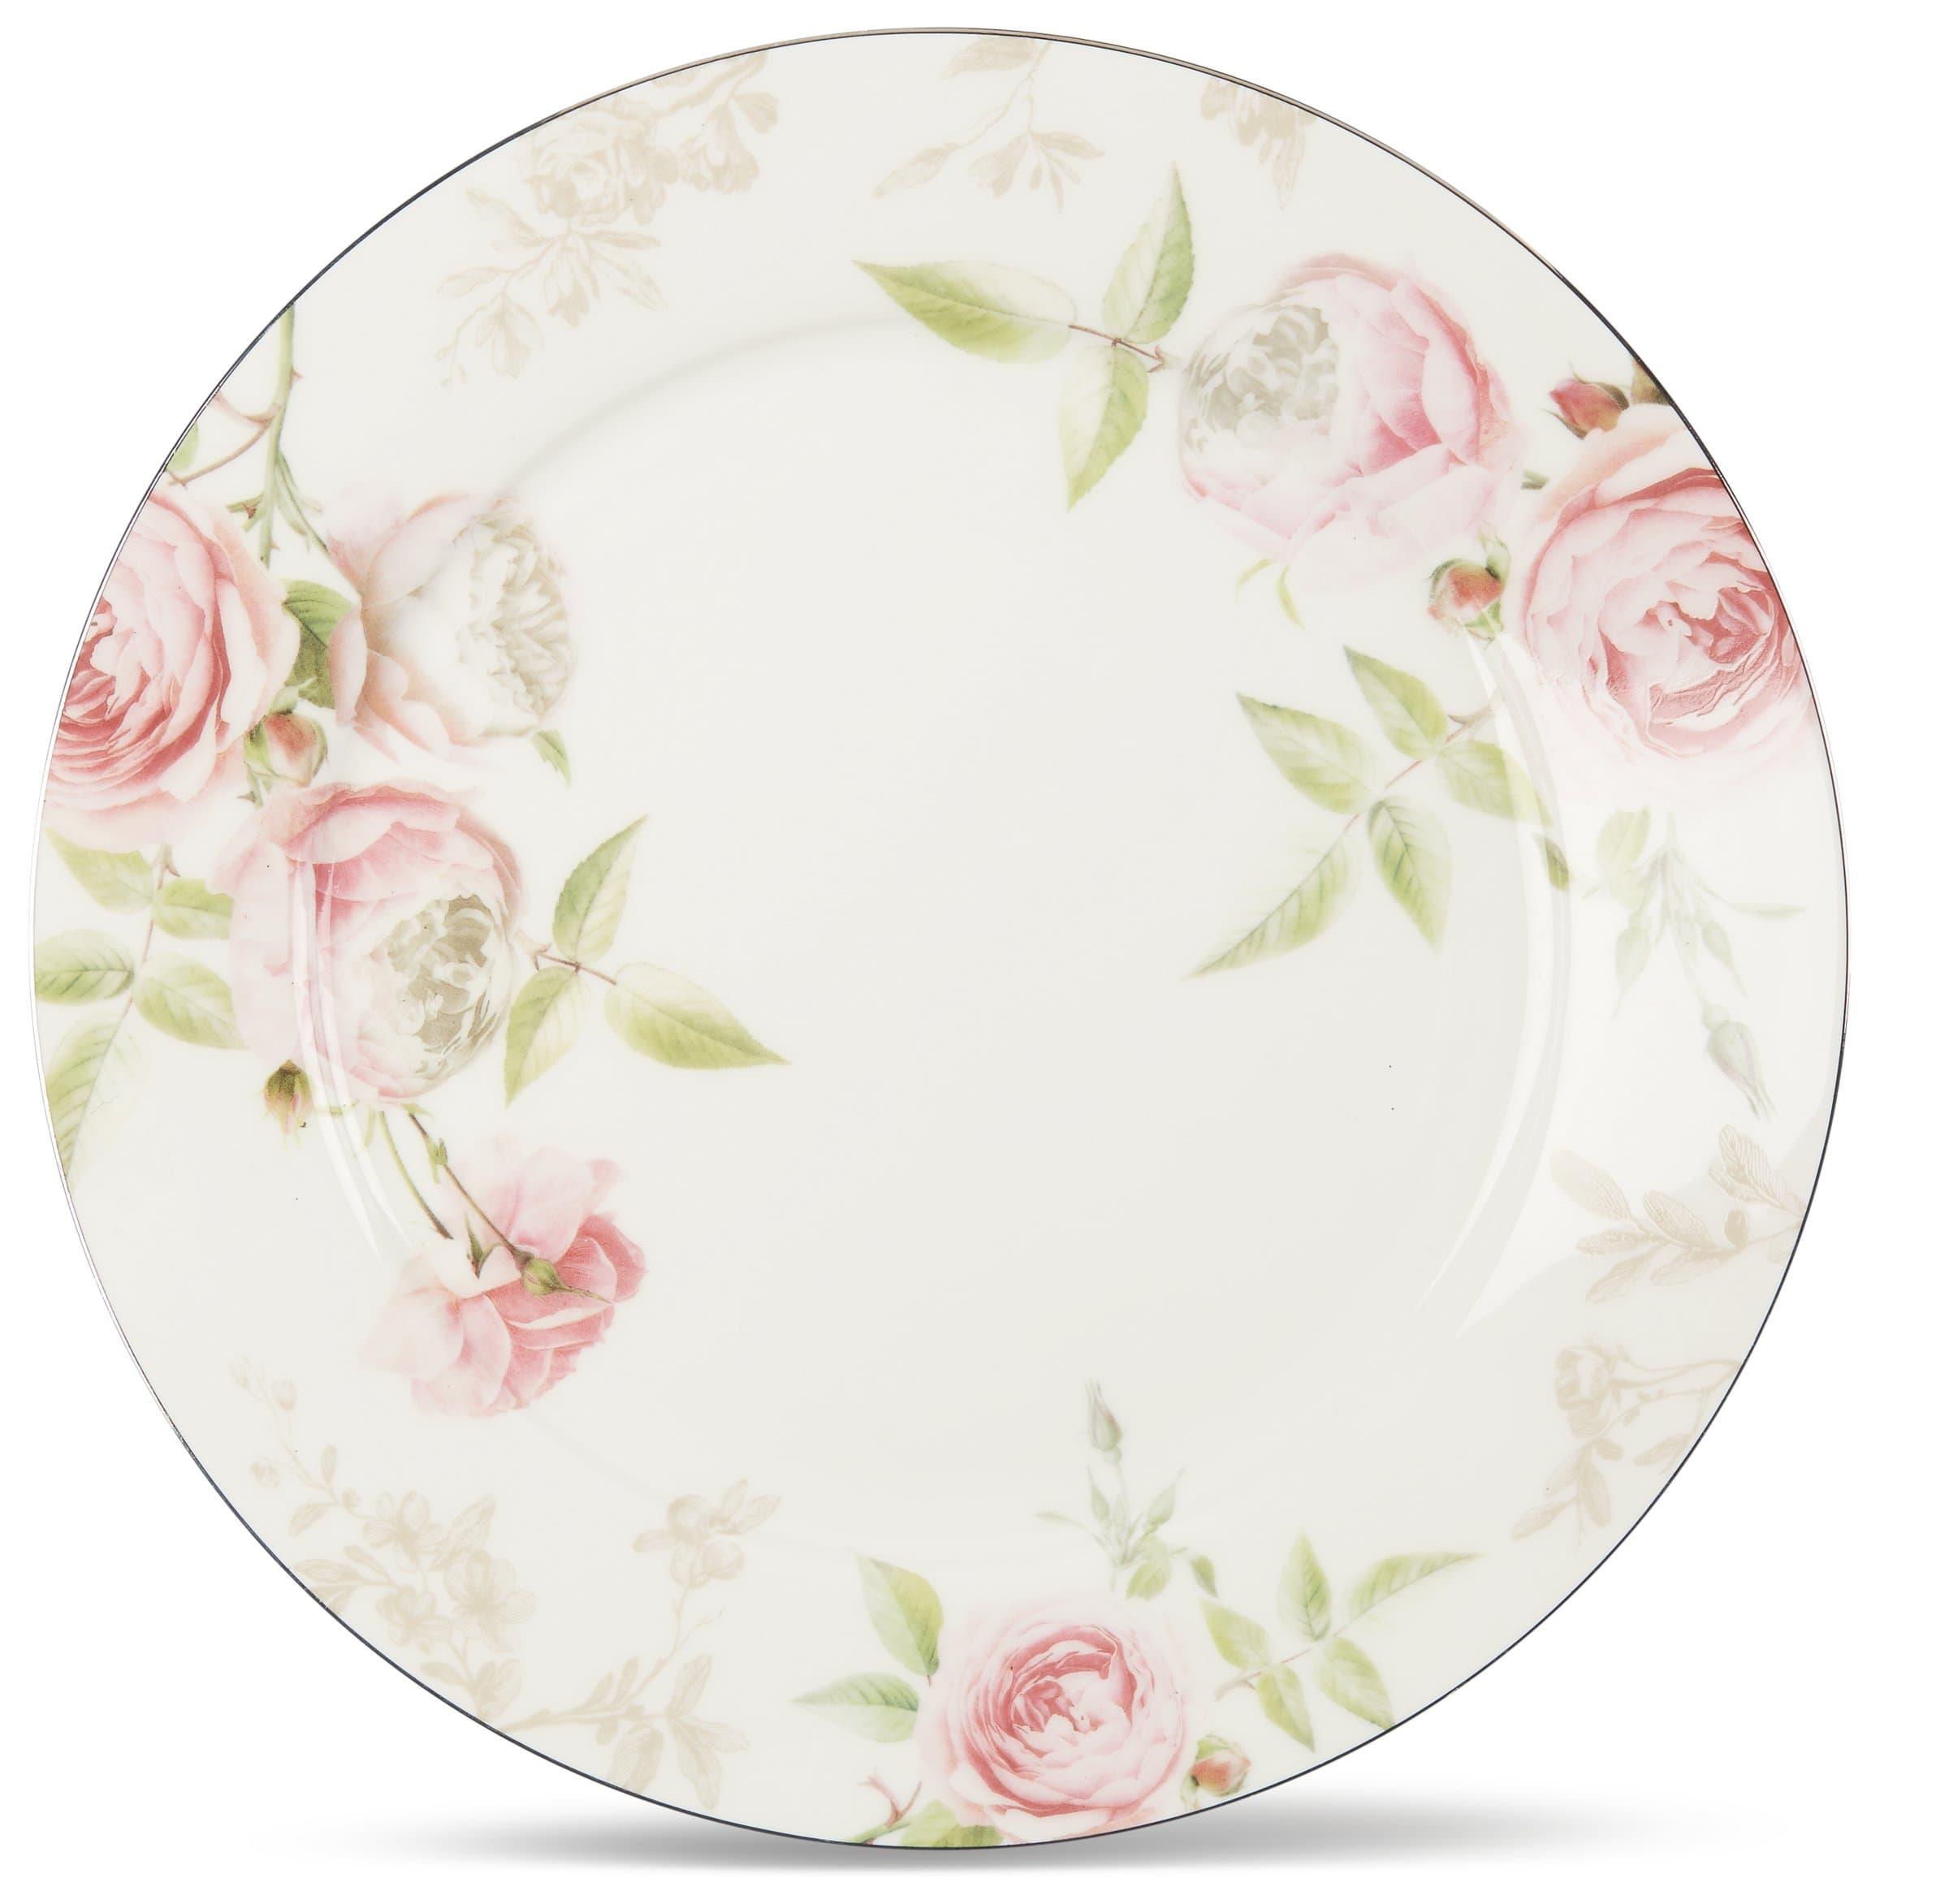 Cucina & Tavola BLOSSOM Assiette plate